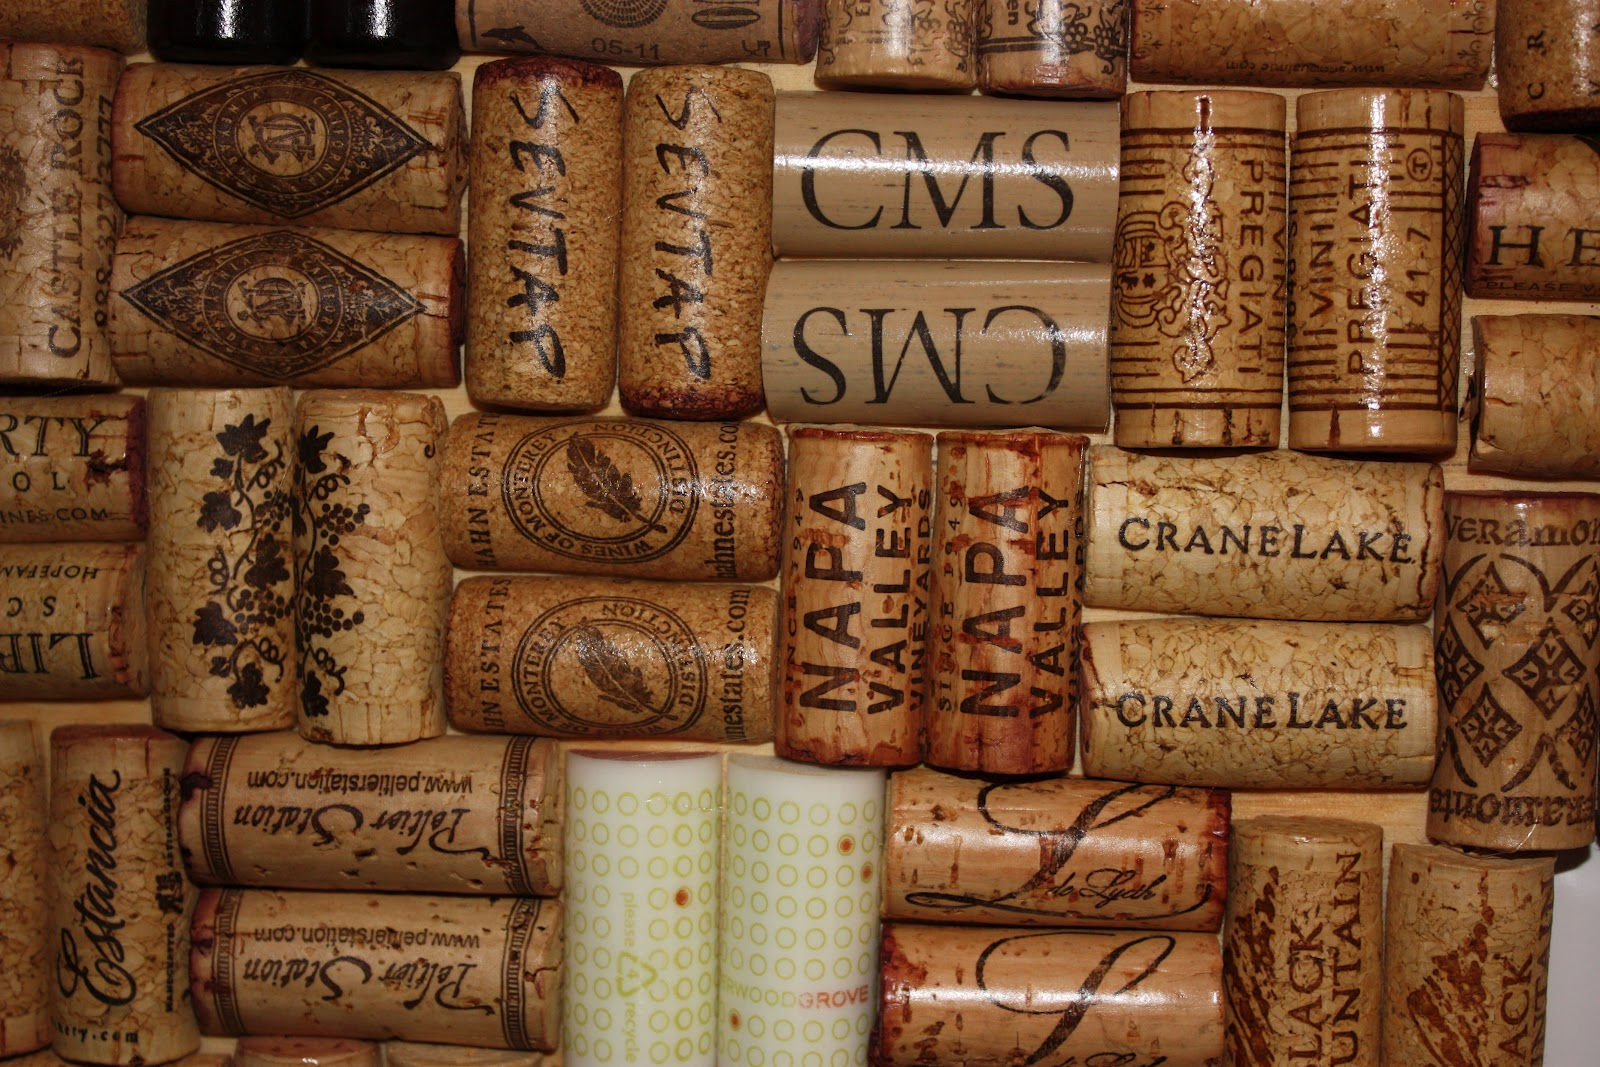 Mandy in Minneapoland: Wine Cork Backsplash